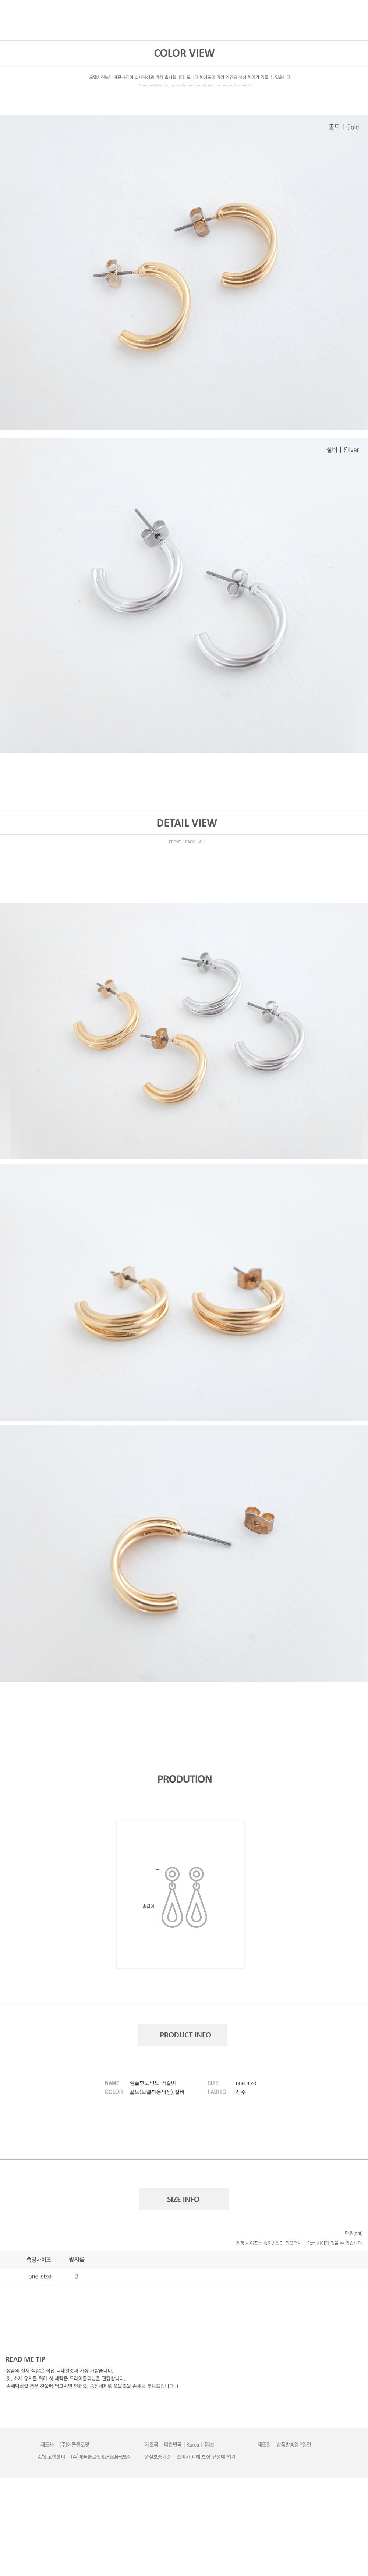 Simple point earrings